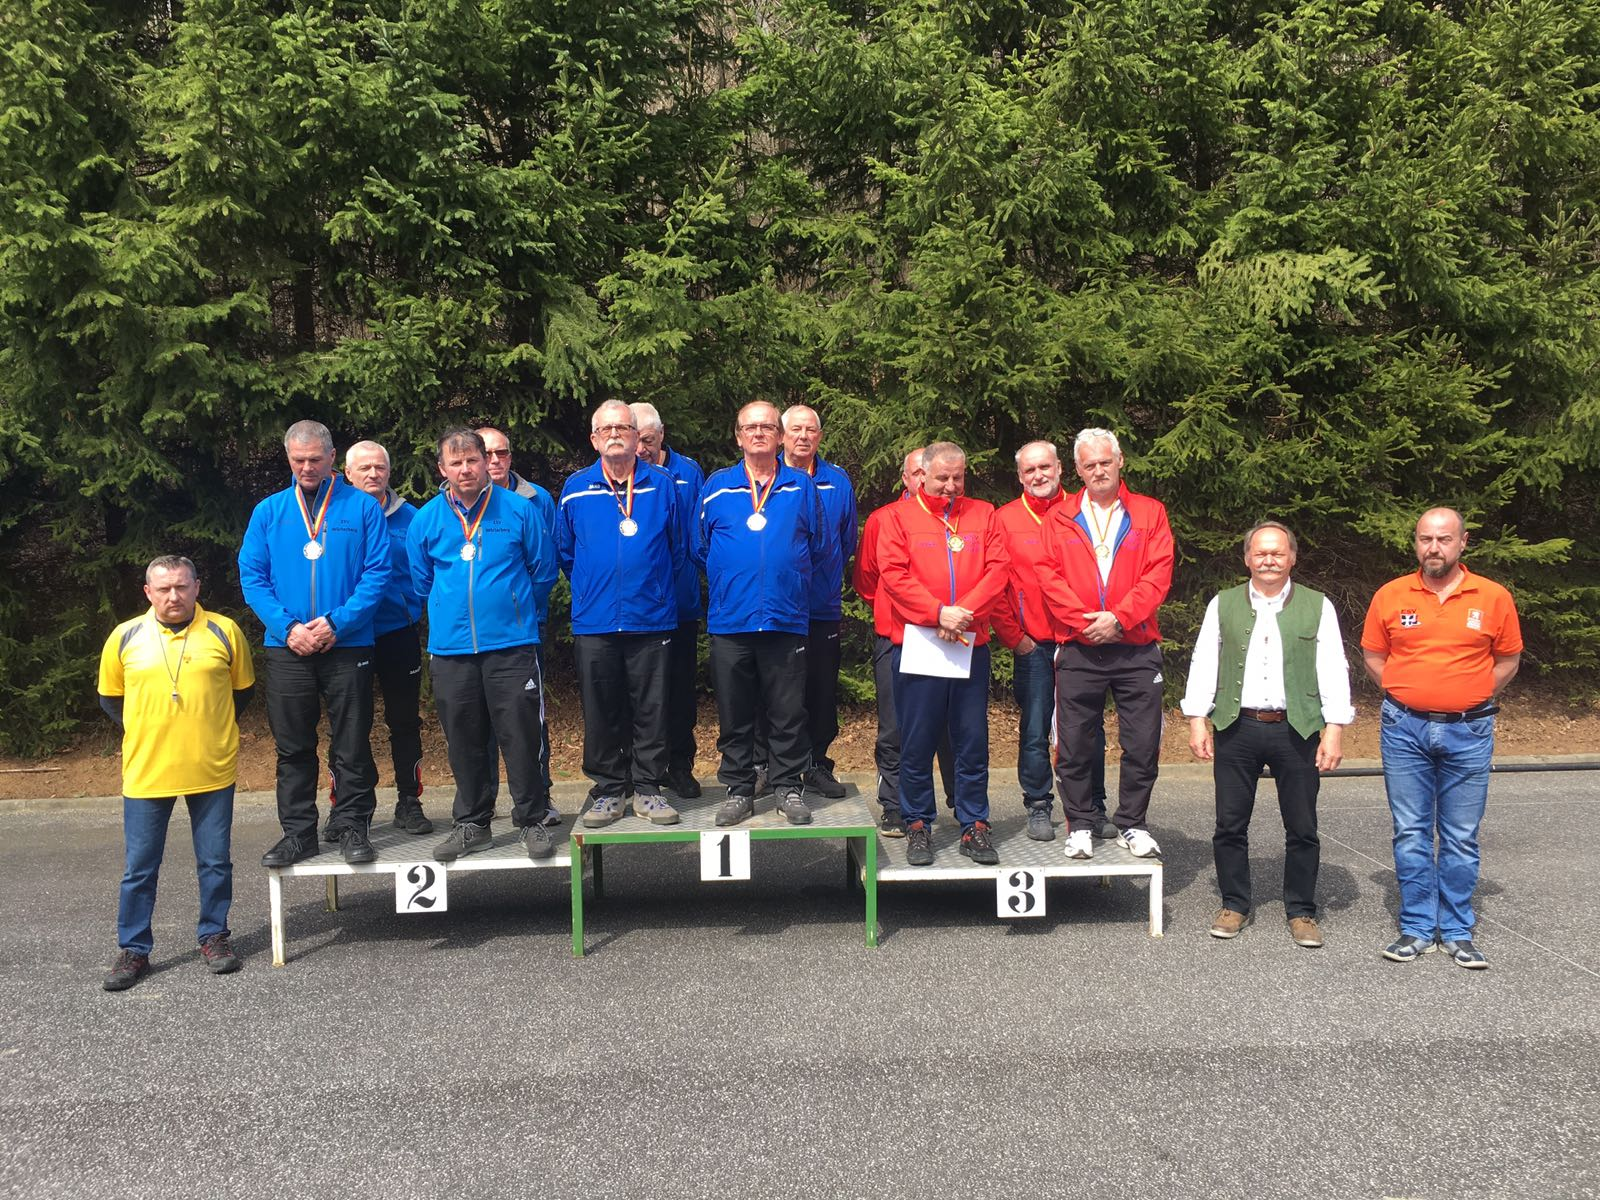 Sommer_Saison_2018_Landesliga.Senioren.Herren_in_Heiligenkreuz_01